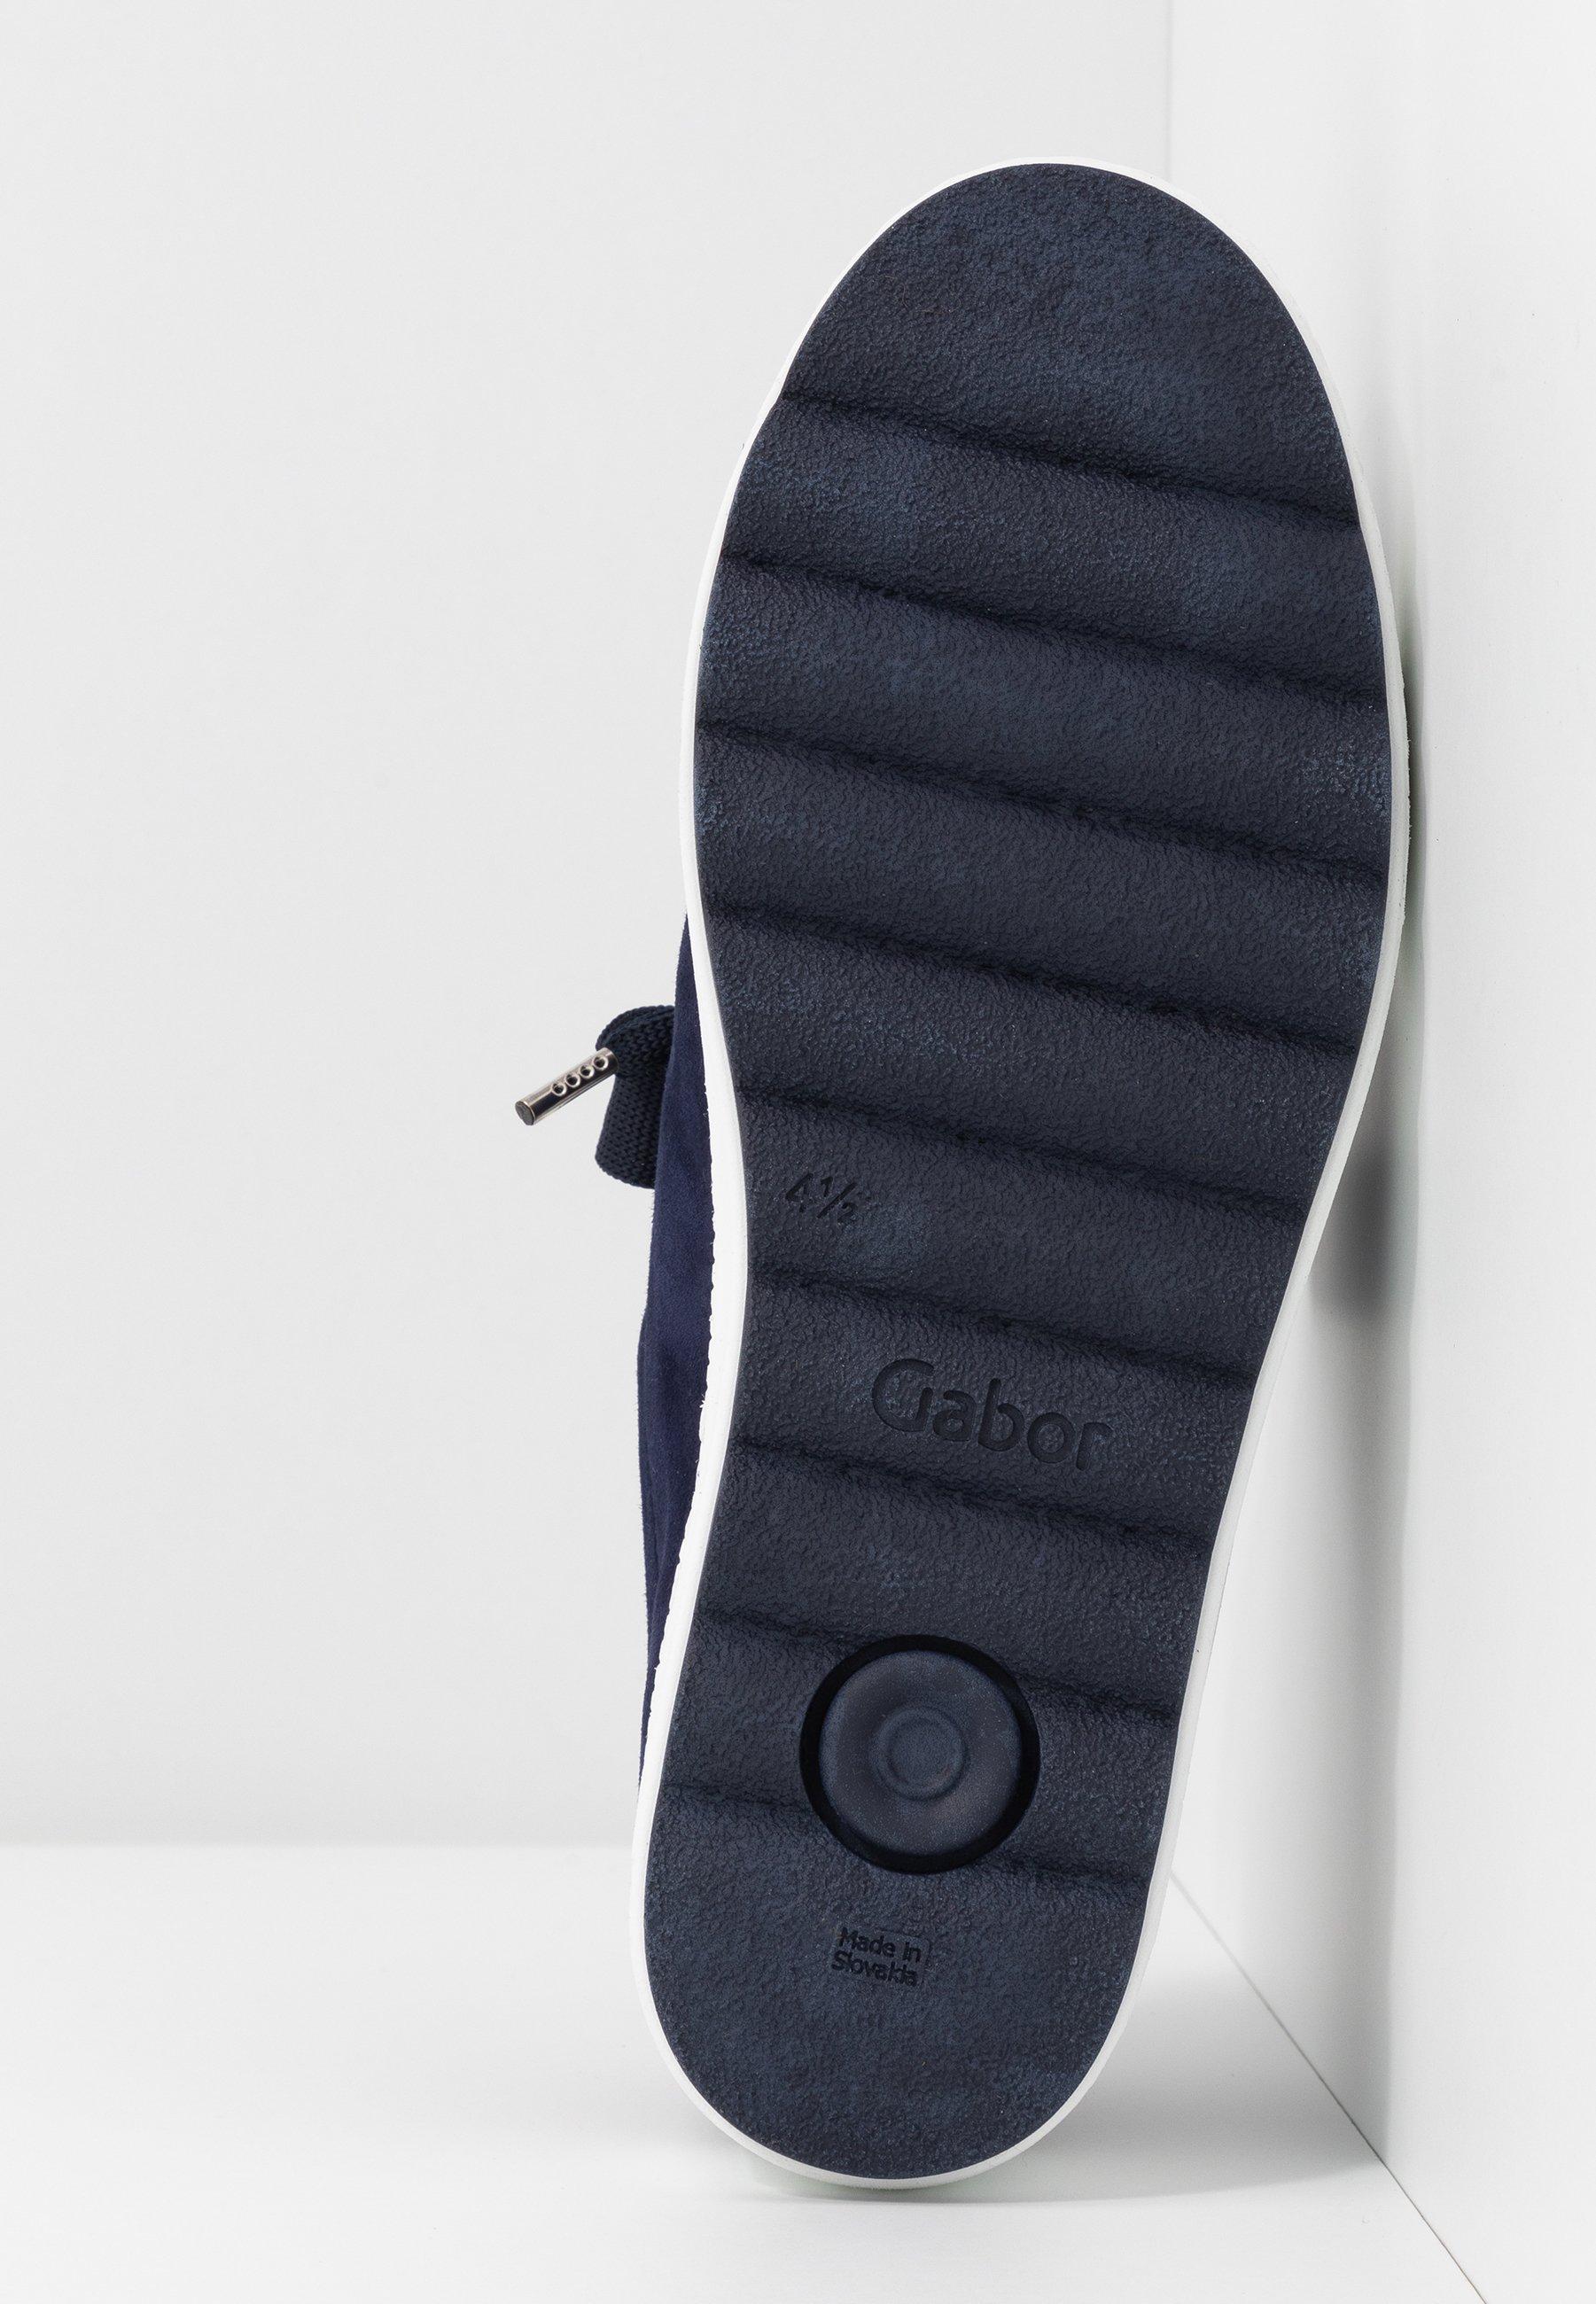 Gabor Comfort Baskets basses - bluette